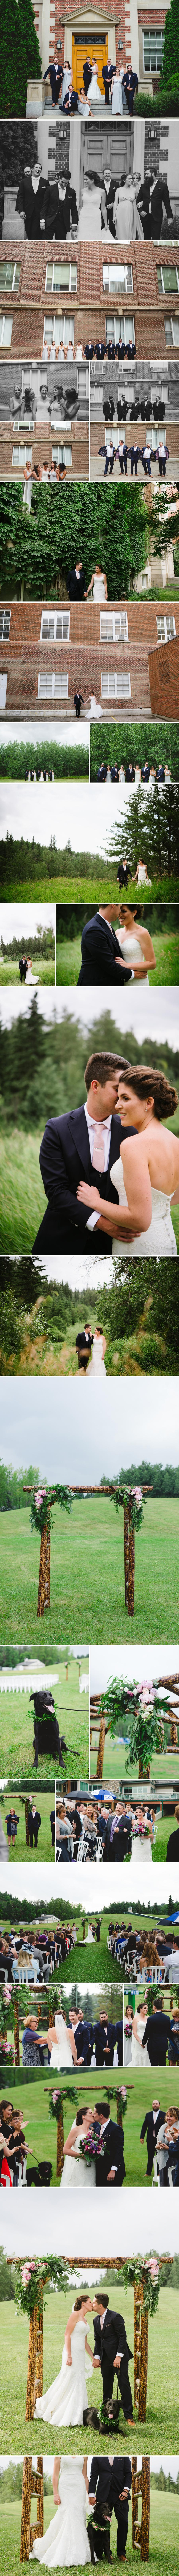 bbcollective_yeg_blog_2017_breannaandhunter_wedding_photographycomp004.jpg